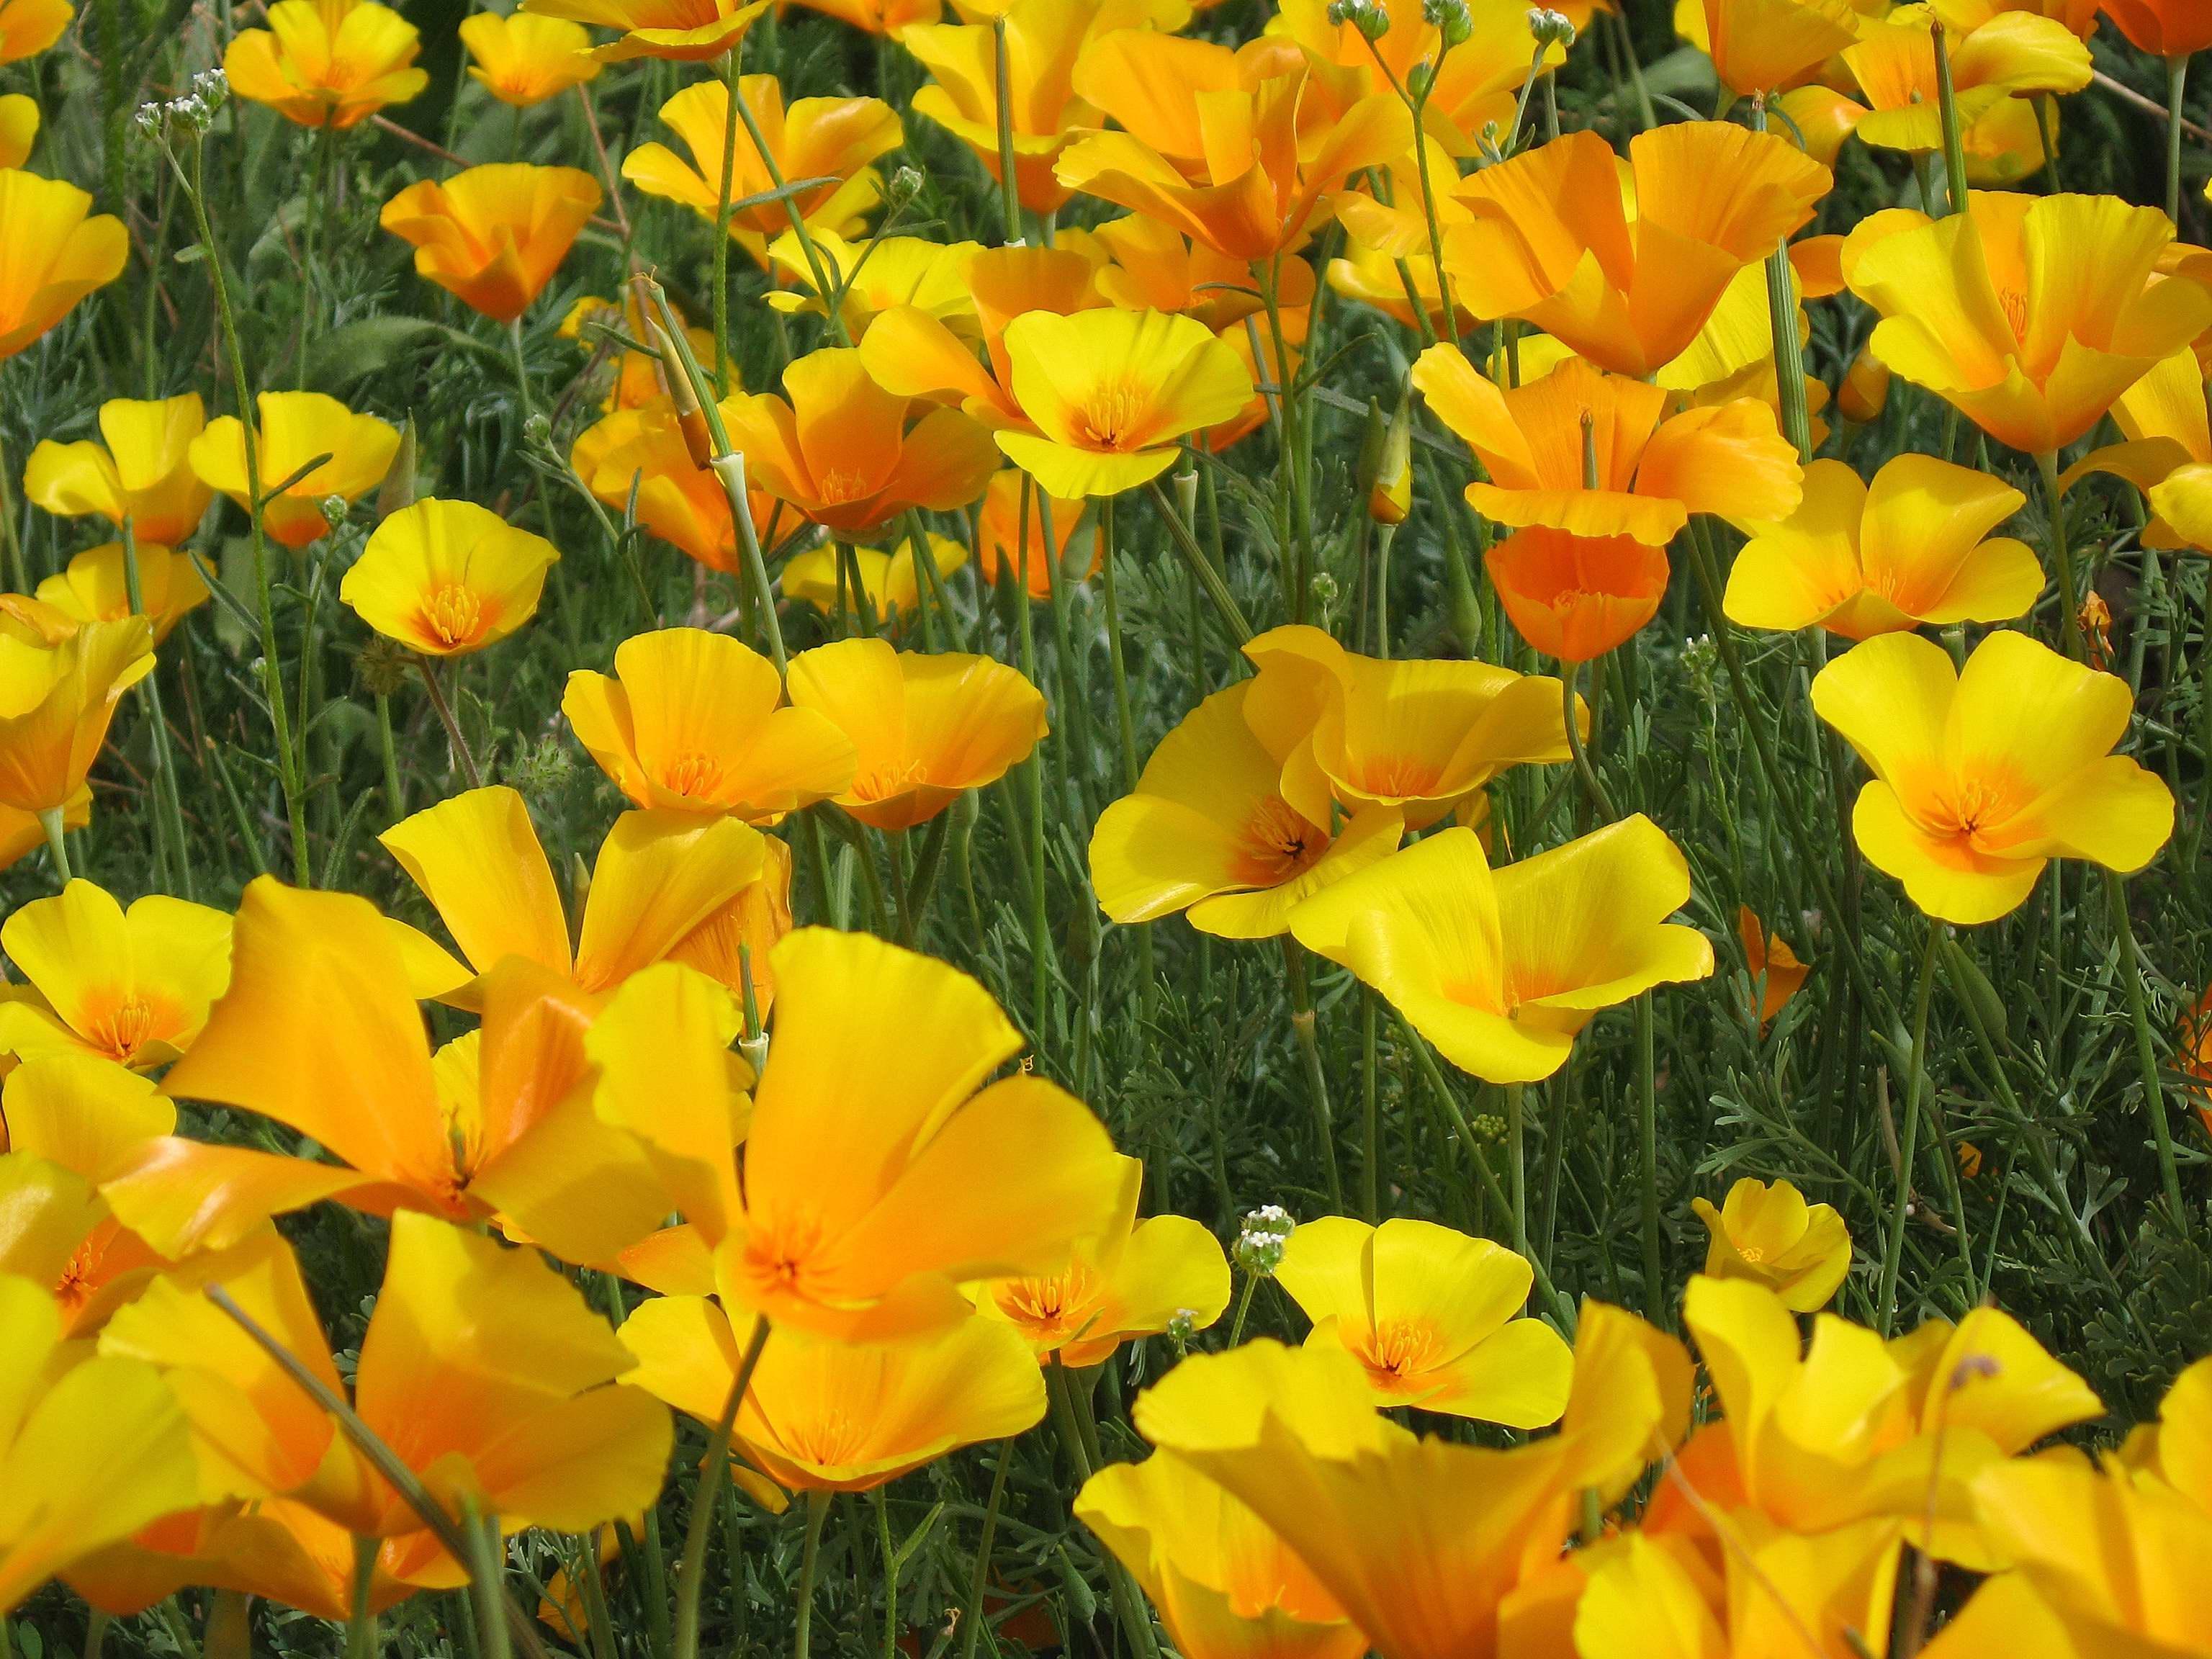 Plant Bios National Border National Park A History Of Organ Pipe